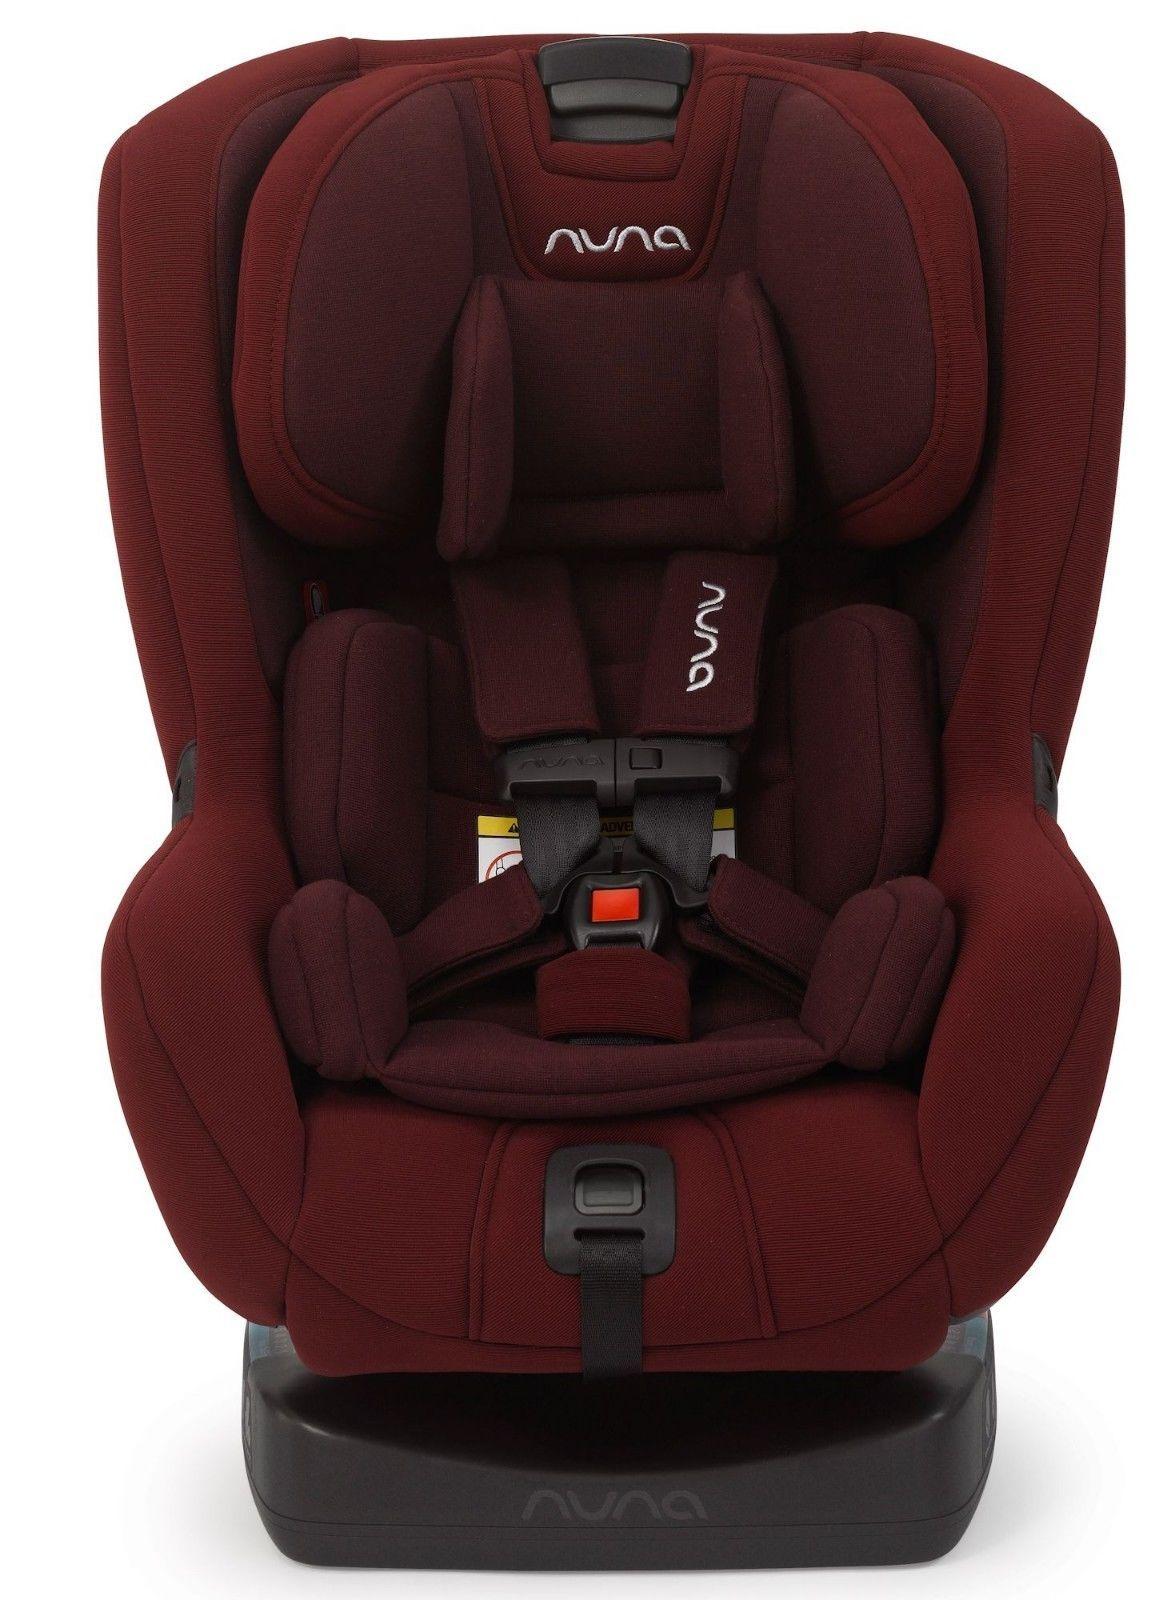 Nuna Baby RAVA Child Safety Convertible Car Seat Berry NEW